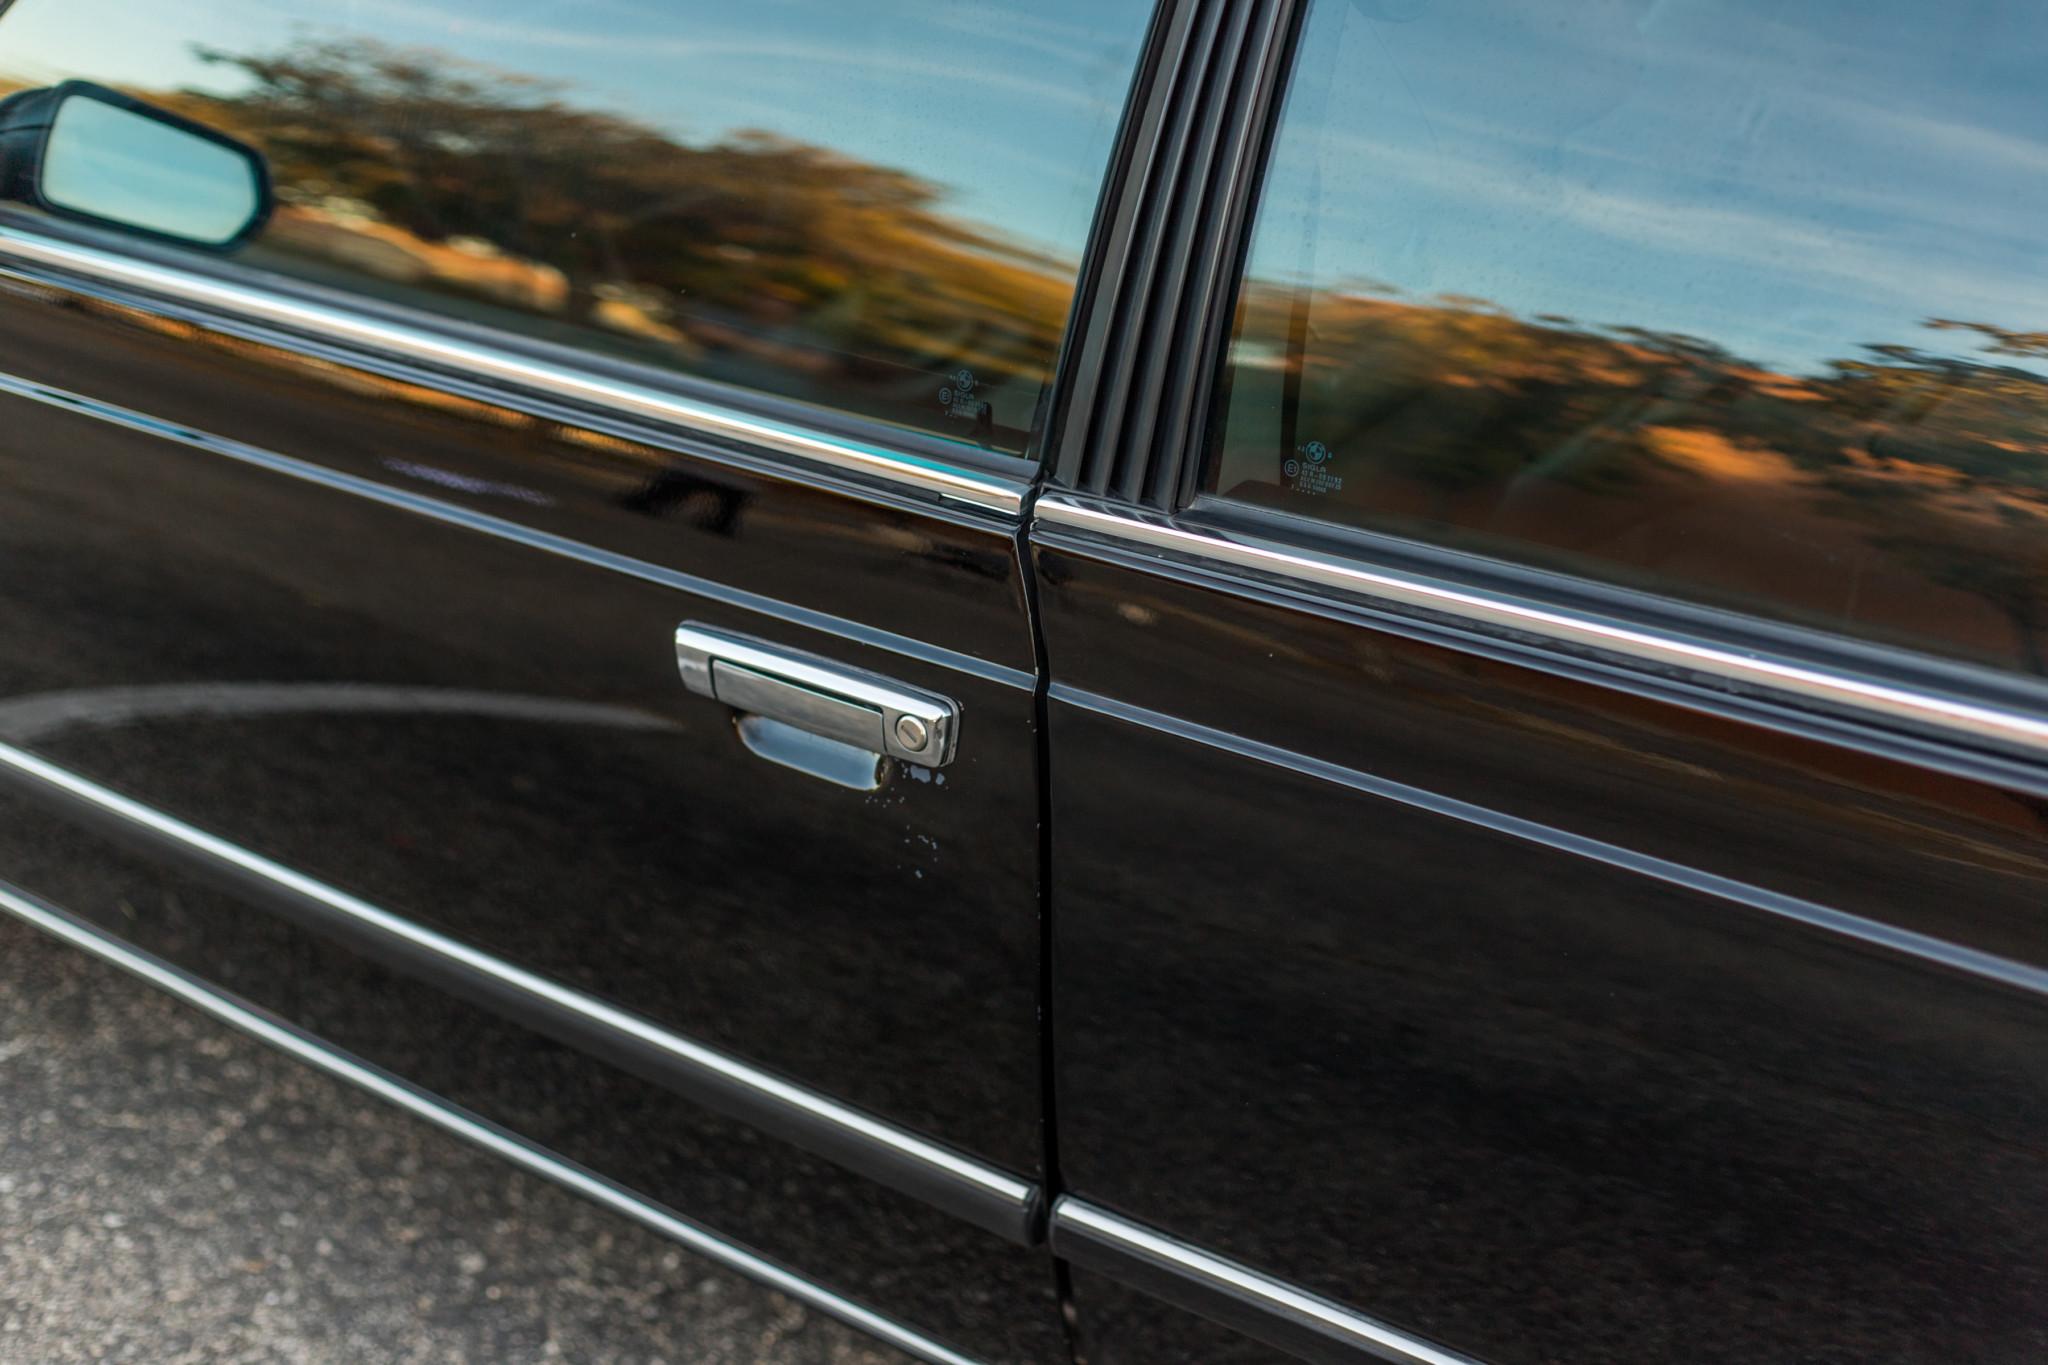 1988 bmw M6 kent classic cars (31).jpg